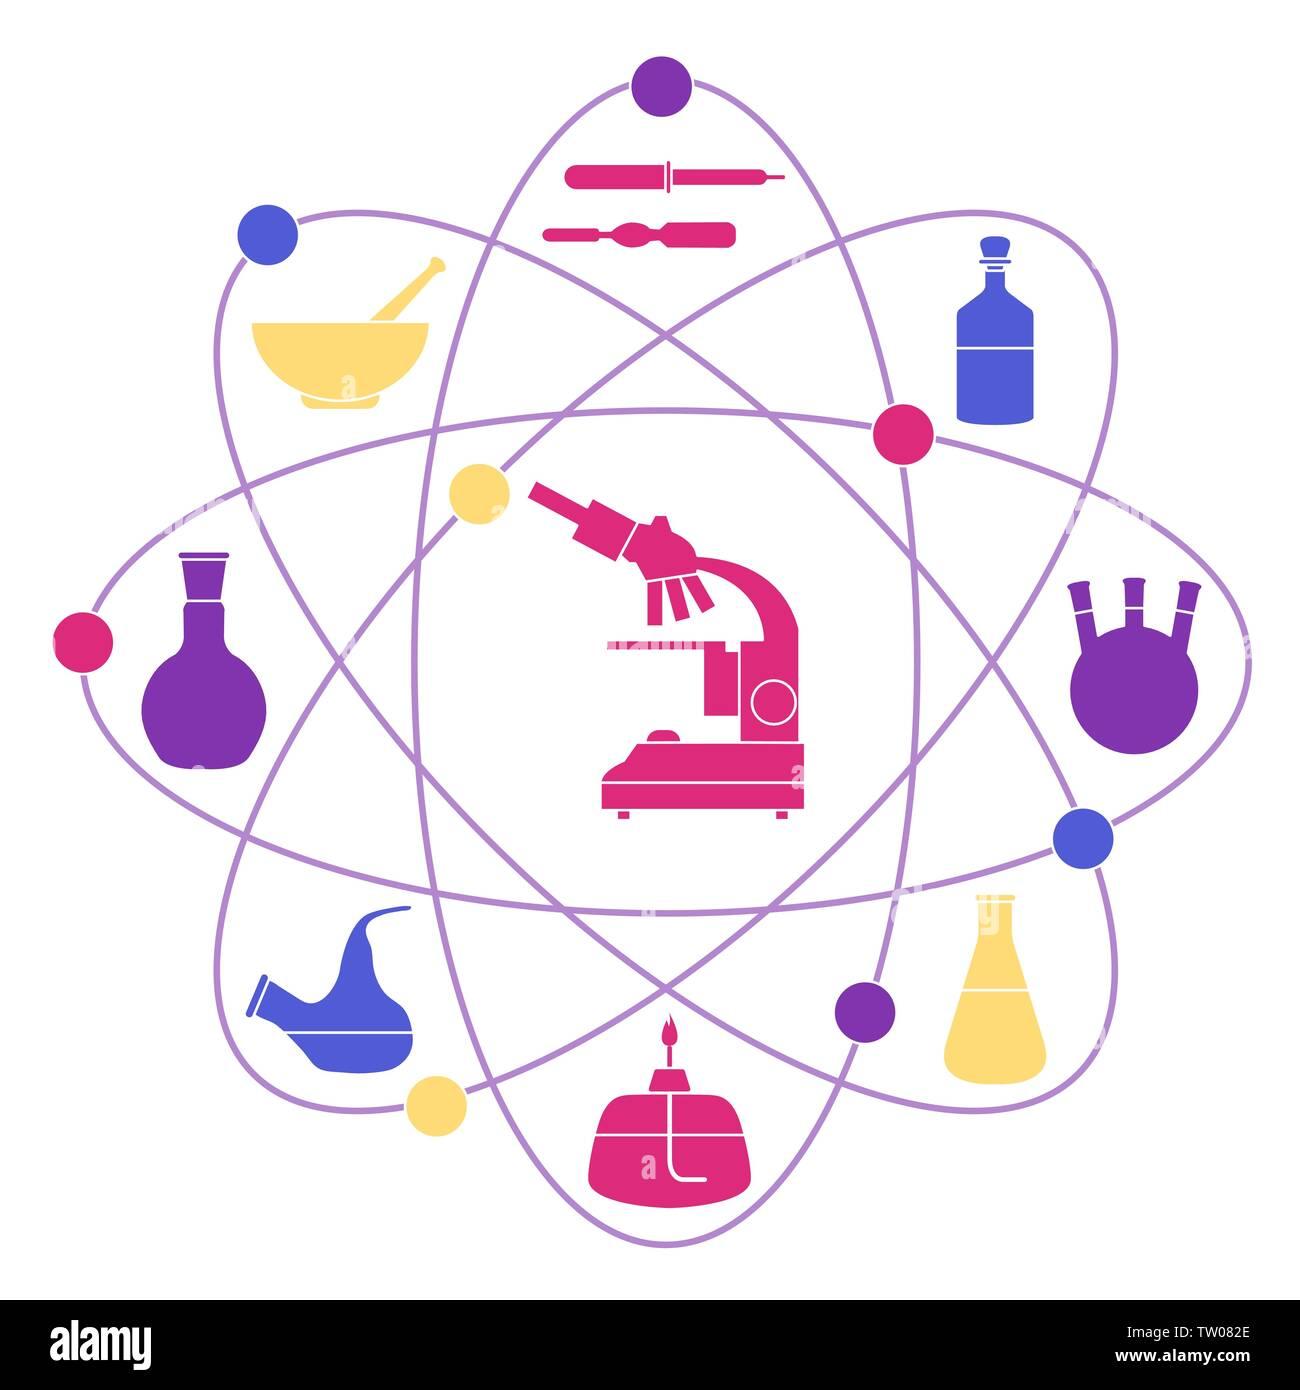 Ilustración Vectorial Con Estructura Atómica Frascos De